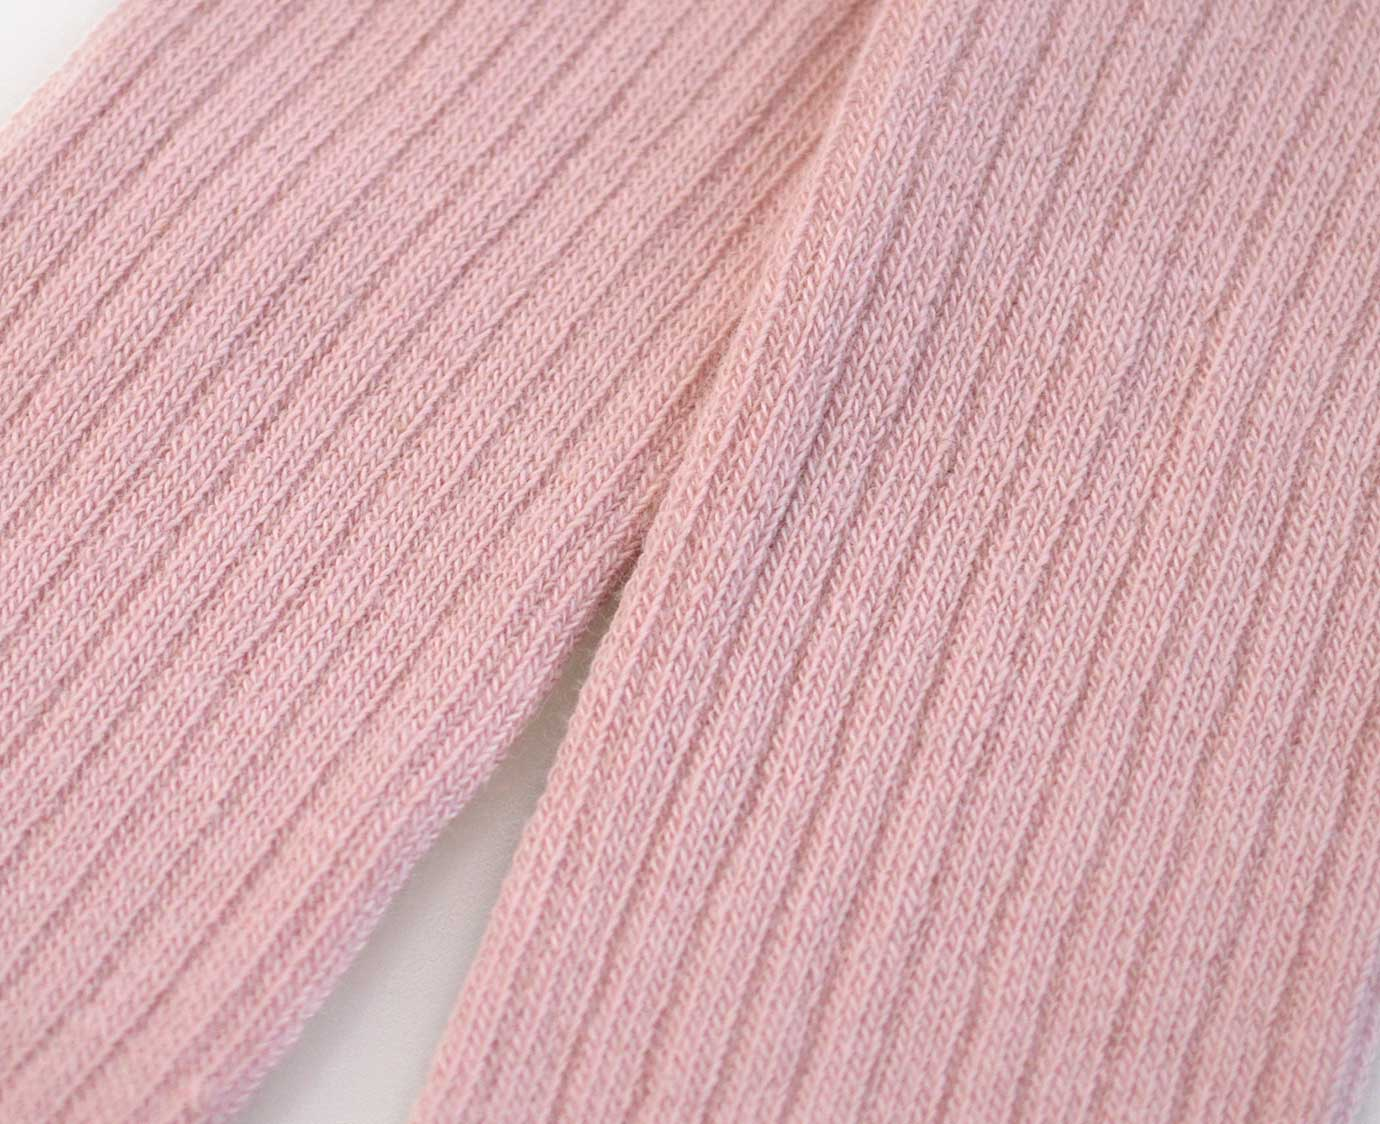 Maillot 'Rib dusty pink'